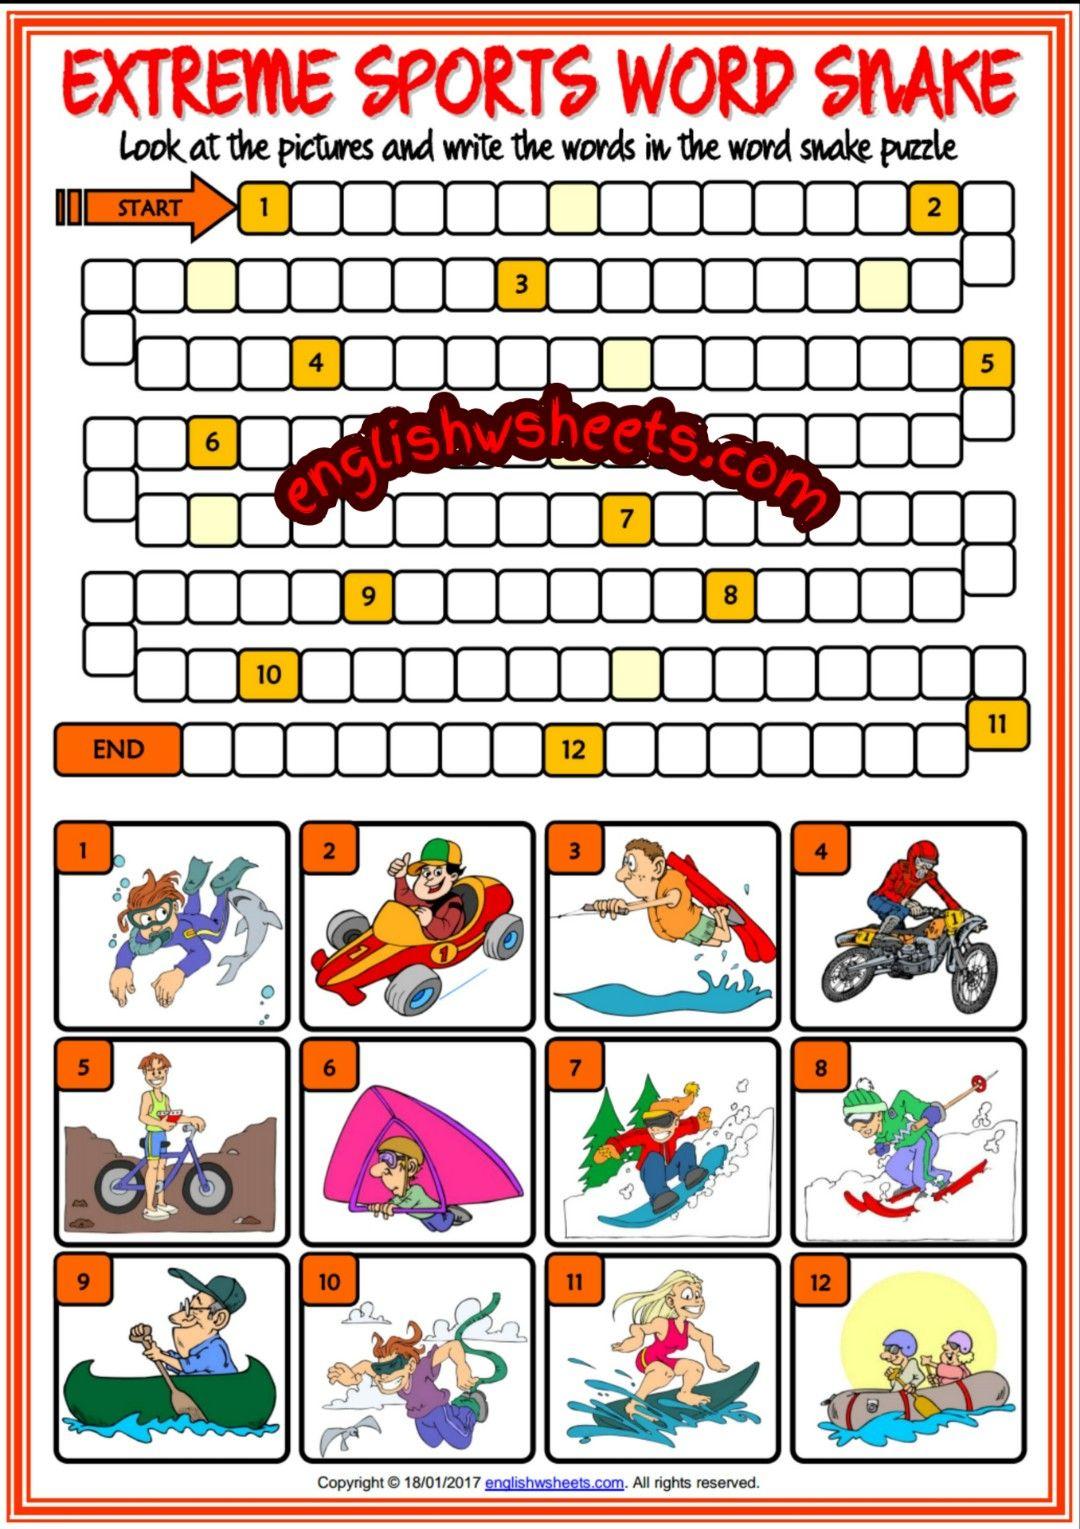 extreme sports esl printable word snake puzzle worksheet for kids word puzzles for kids fun. Black Bedroom Furniture Sets. Home Design Ideas